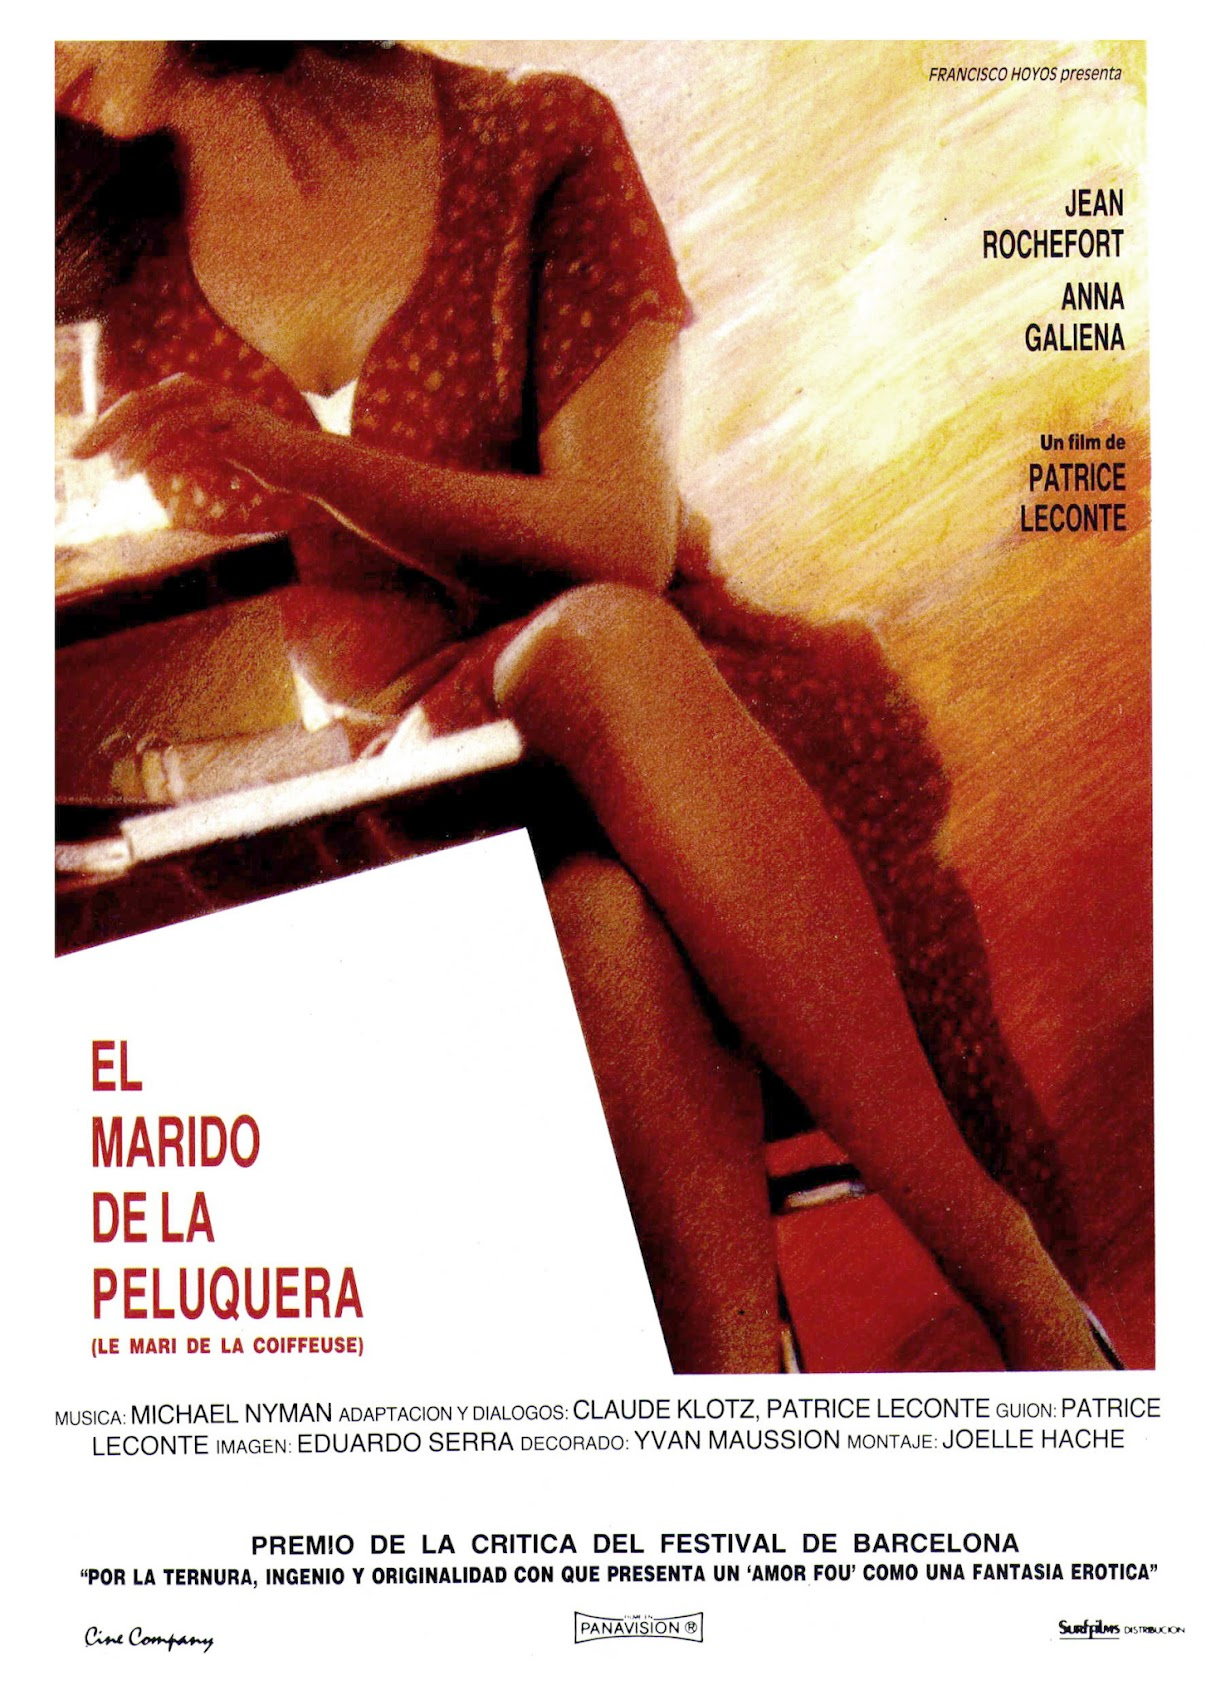 http://2.bp.blogspot.com/-0DdF3seEGKI/UZ1RLTPXRDI/AAAAAAAAAPo/pYRYHXb1LTs/s1700/marido_de_la_peluquera_-_Le_Mari_de_la_coiffeuse_-_tt0100112_-_1990_-_es.jpg